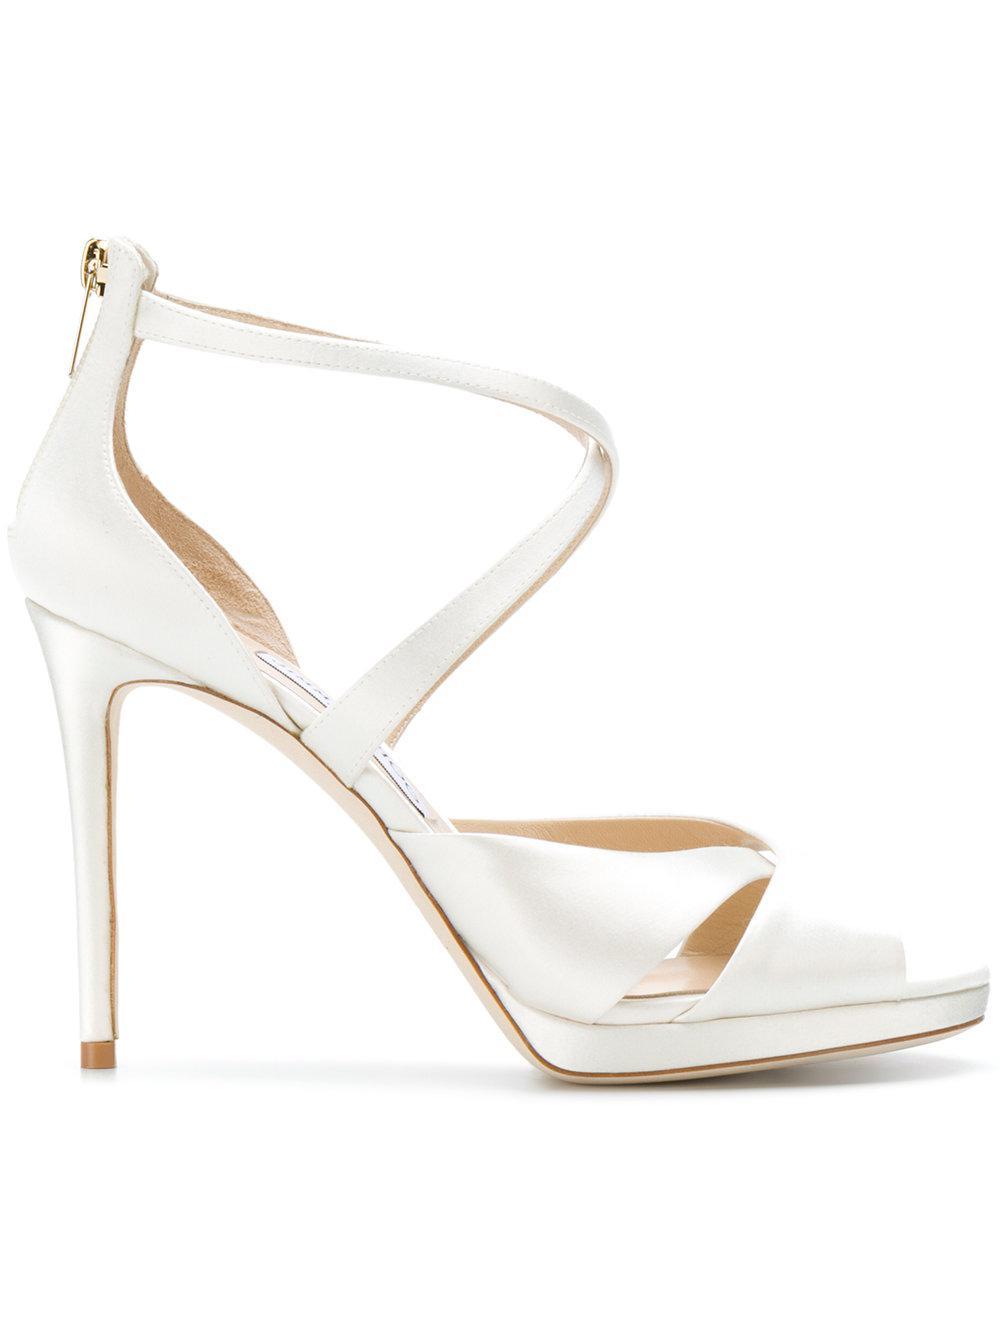 eda90901d27 Lyst - Jimmy Choo Lorina 100 Sandals in White